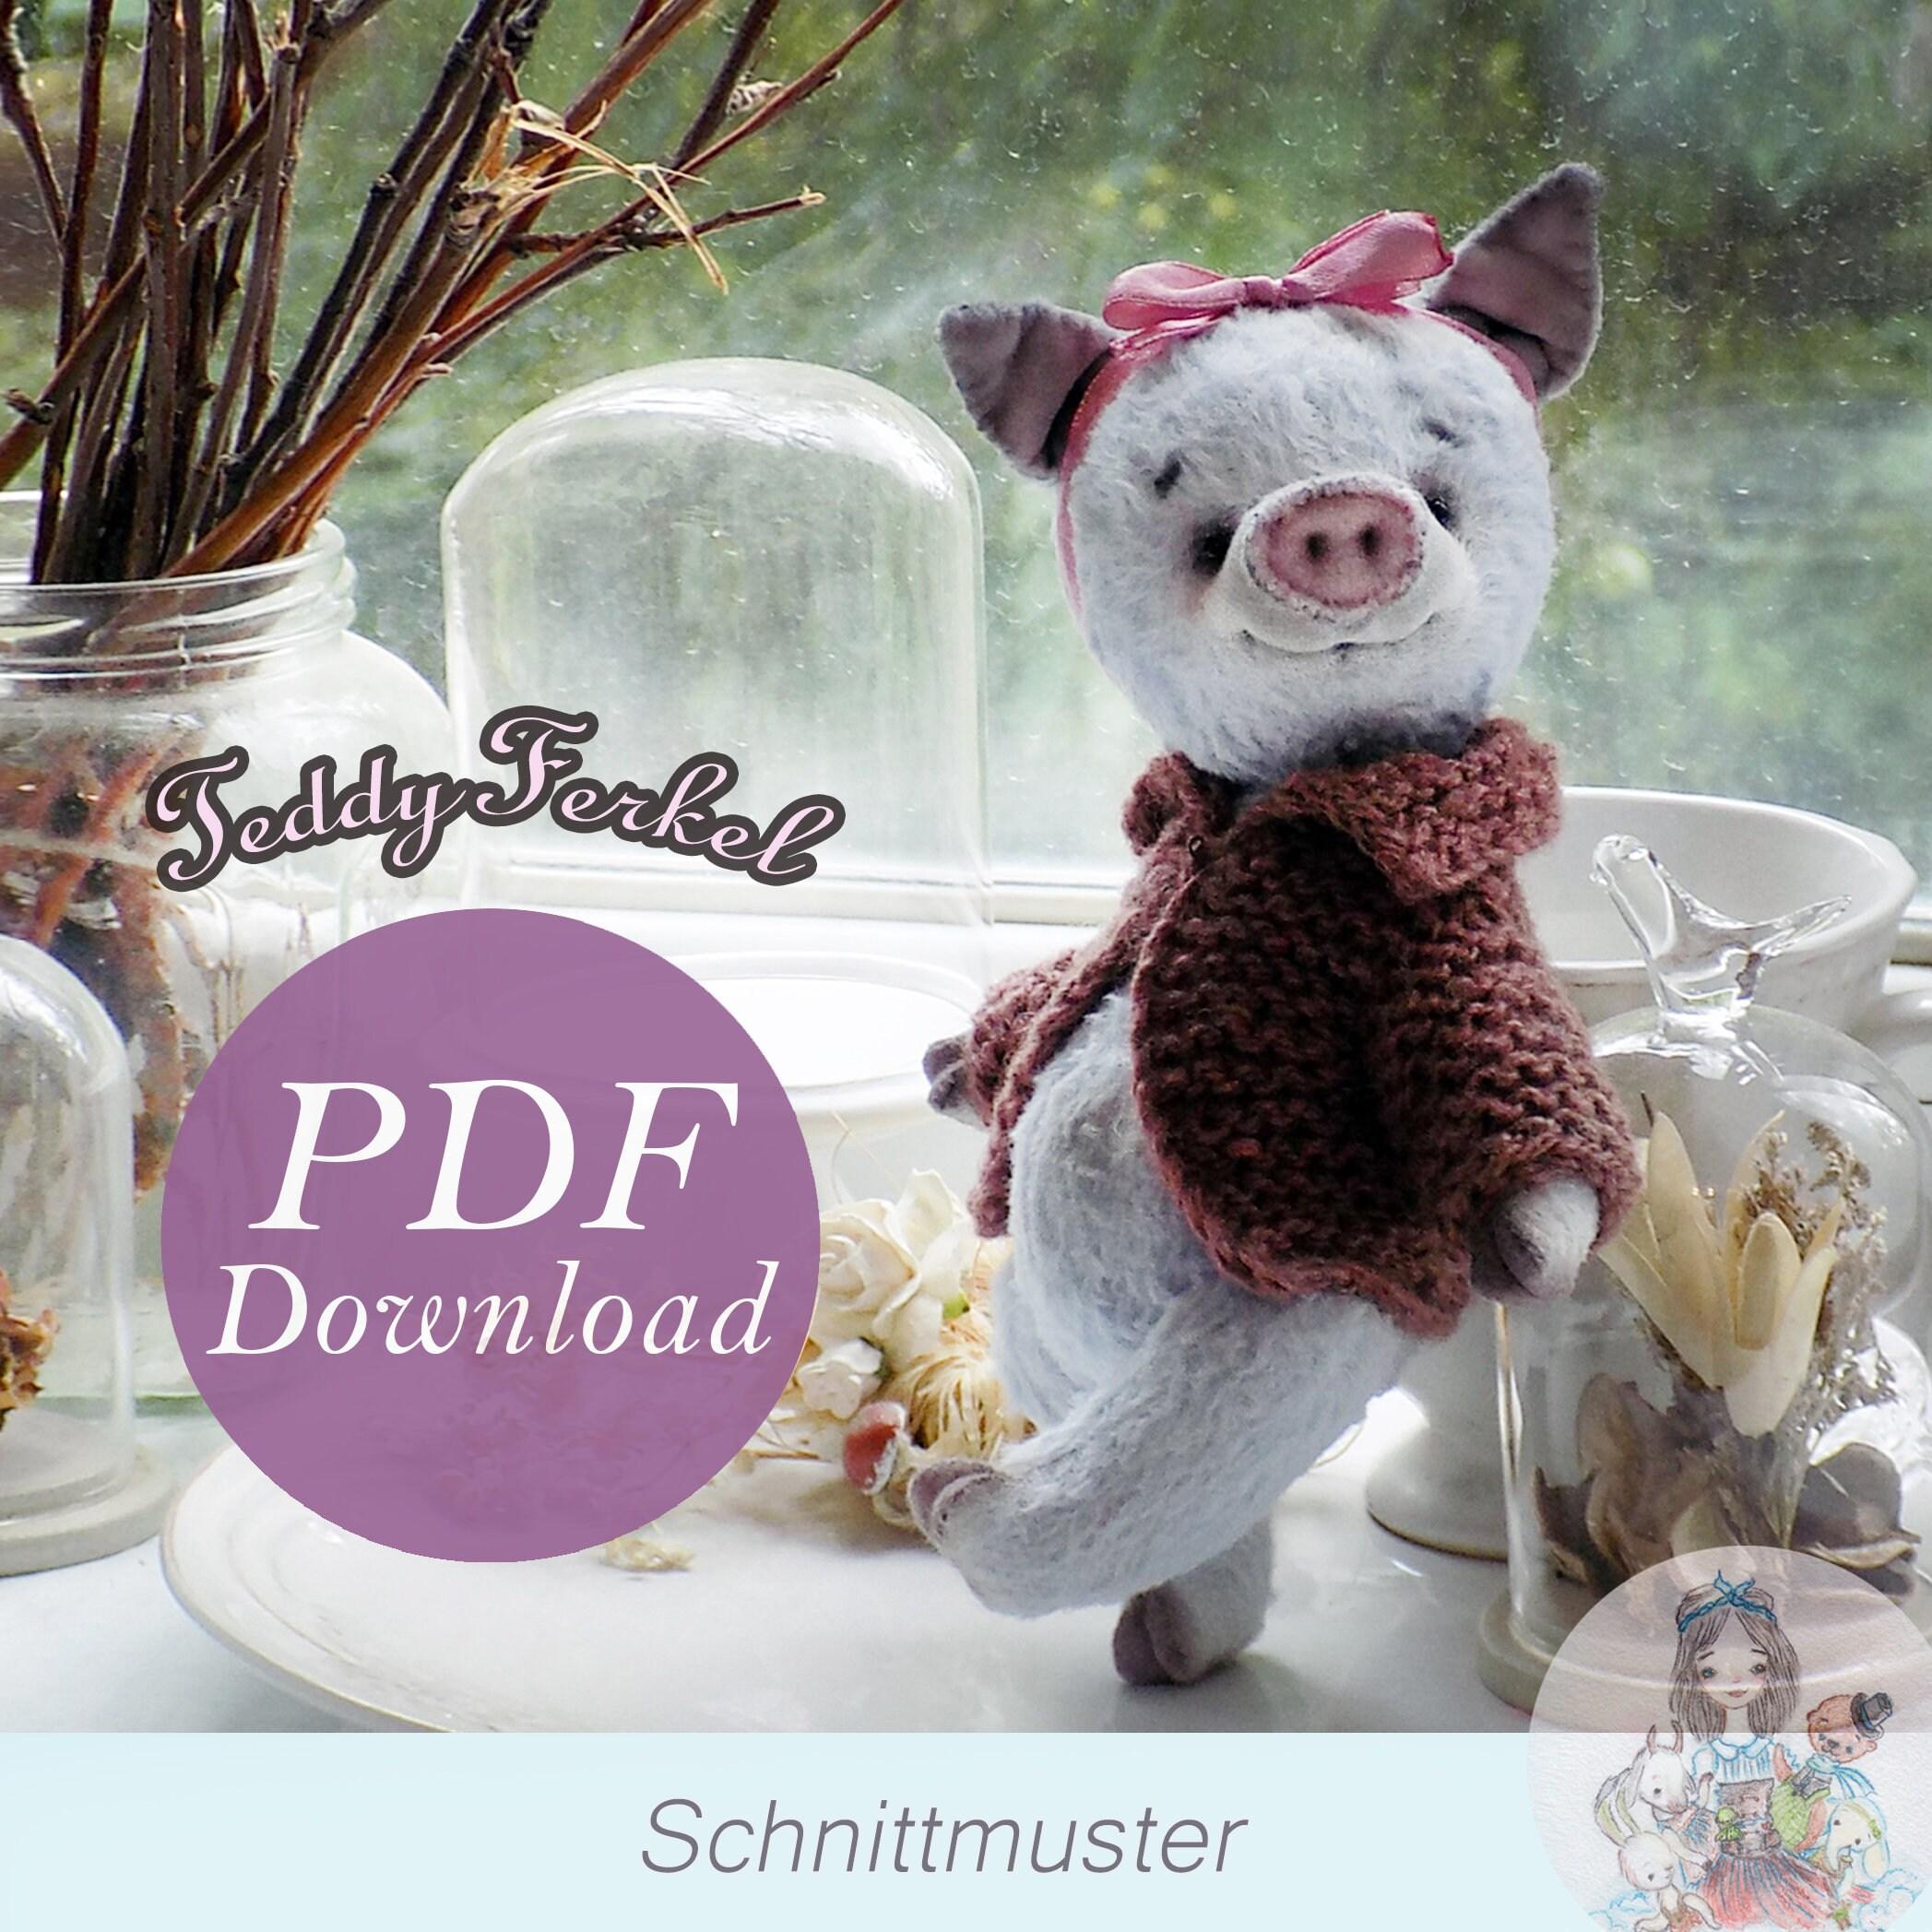 Awesome Schwein Schnittmuster Picture Collection - Decke Stricken ...